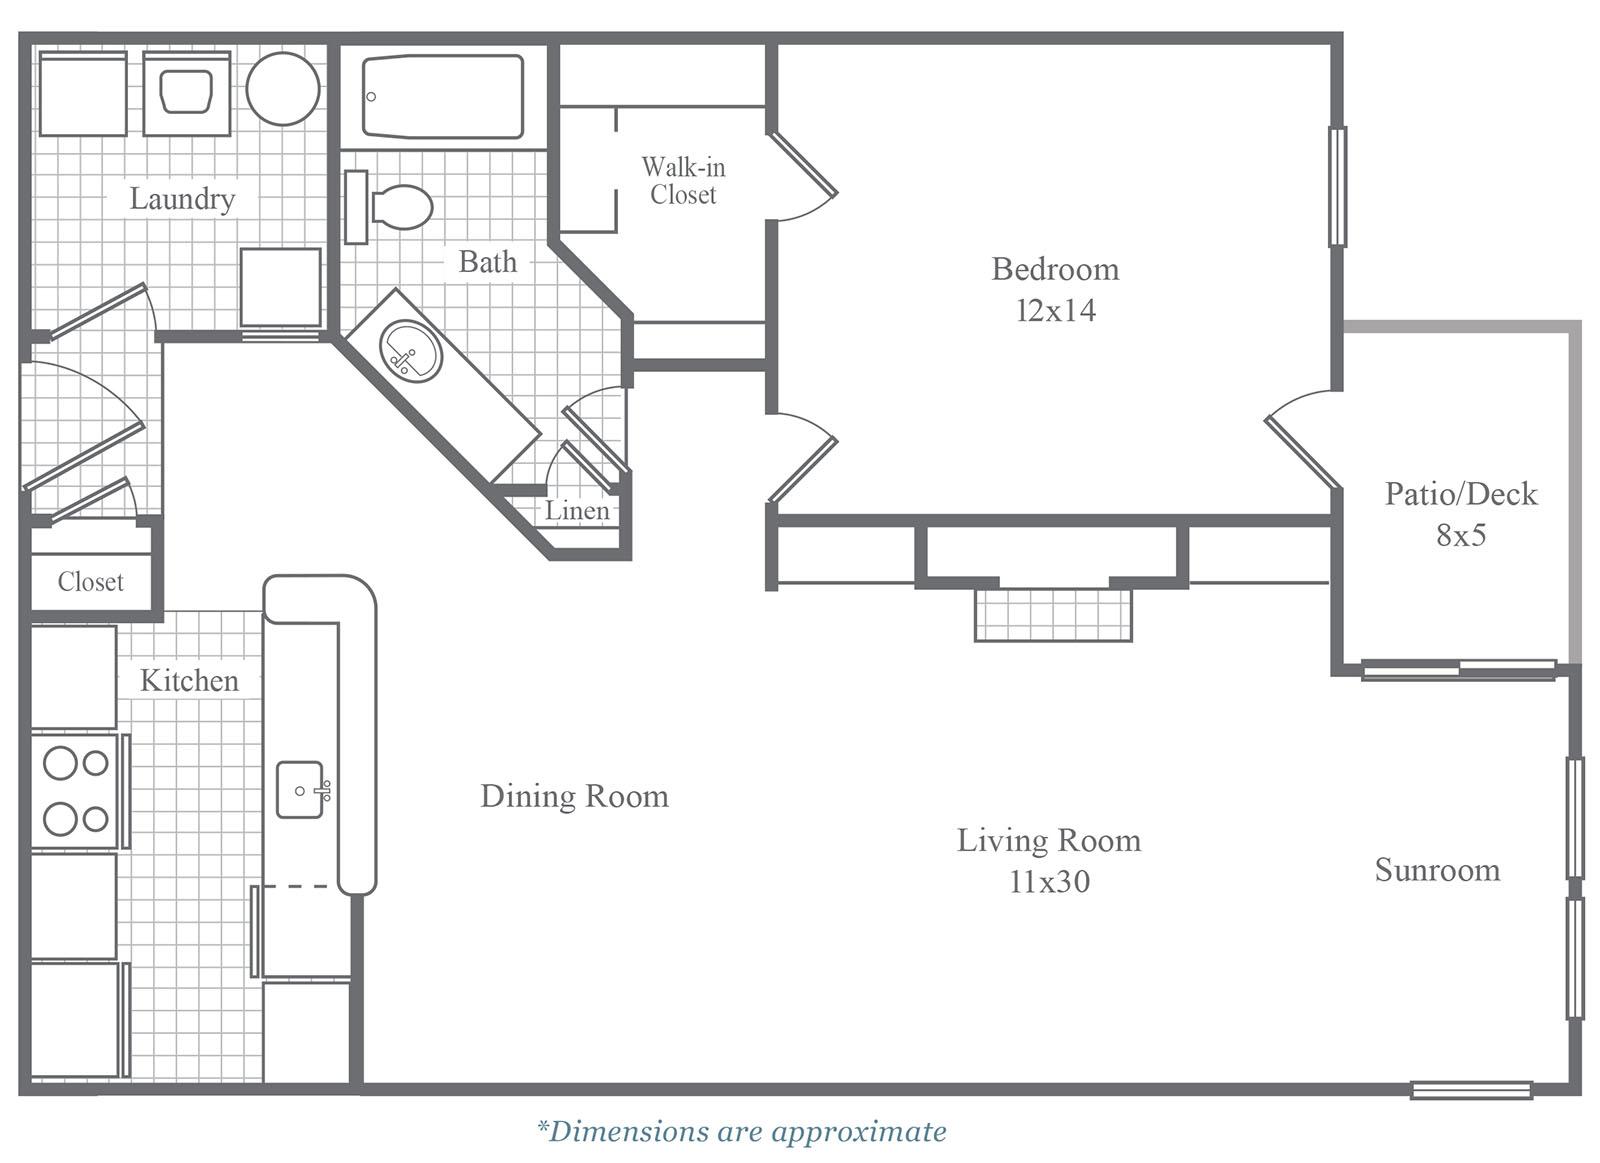 classic floor plans - calibre woods